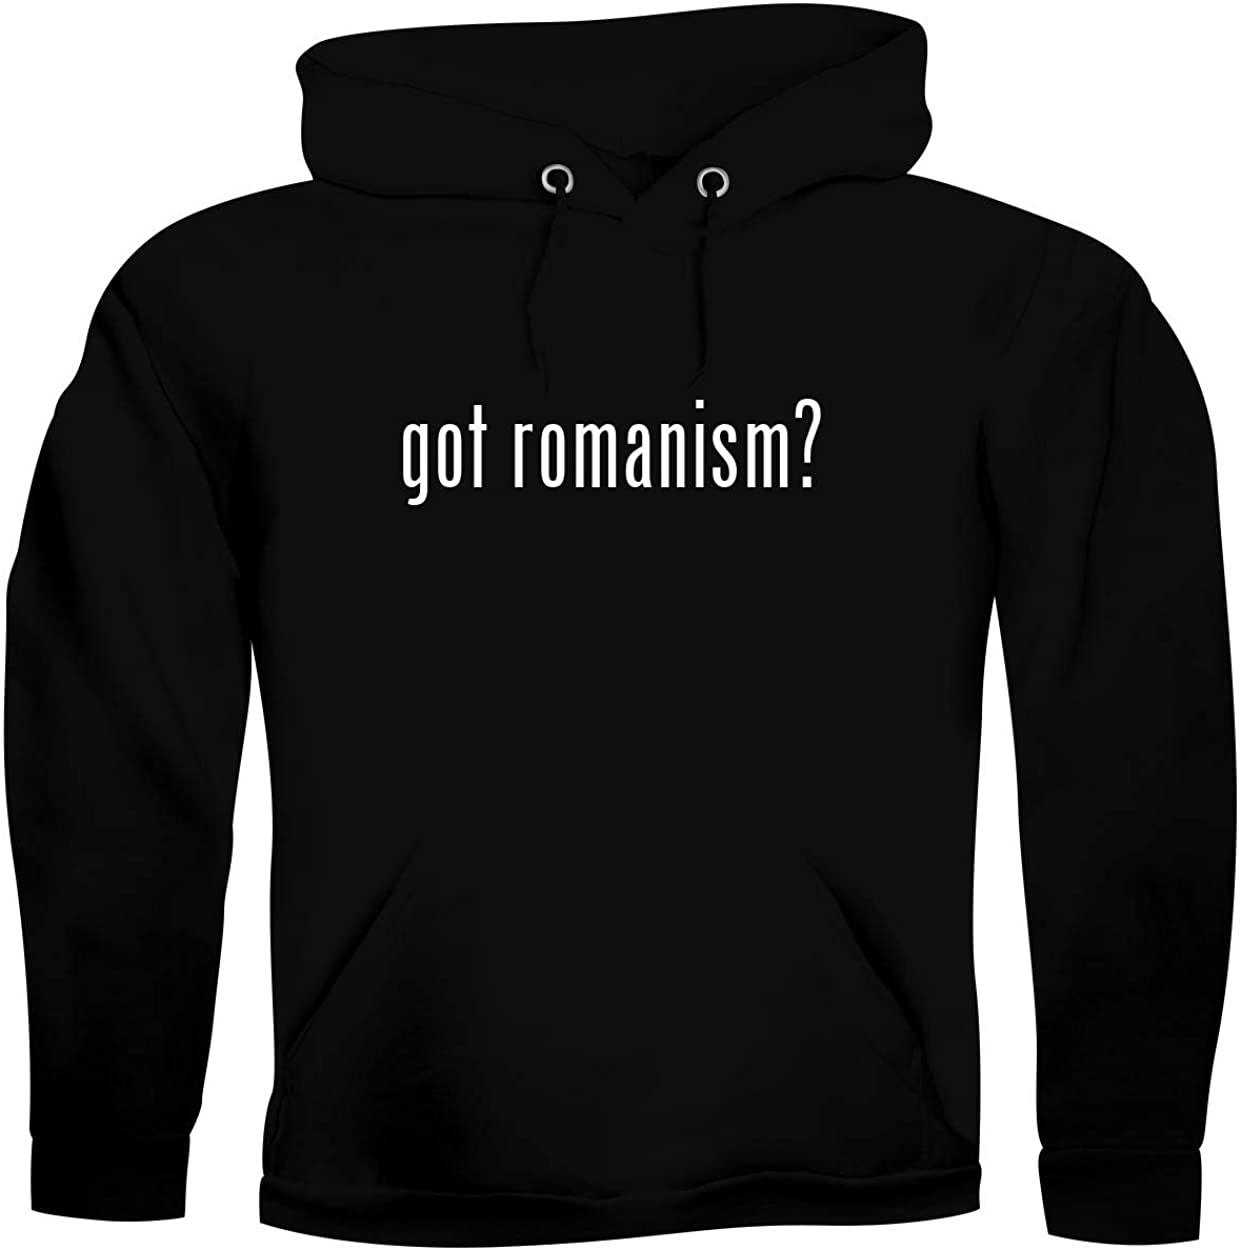 got romanism? - Men's Ultra Soft Hoodie Sweatshirt